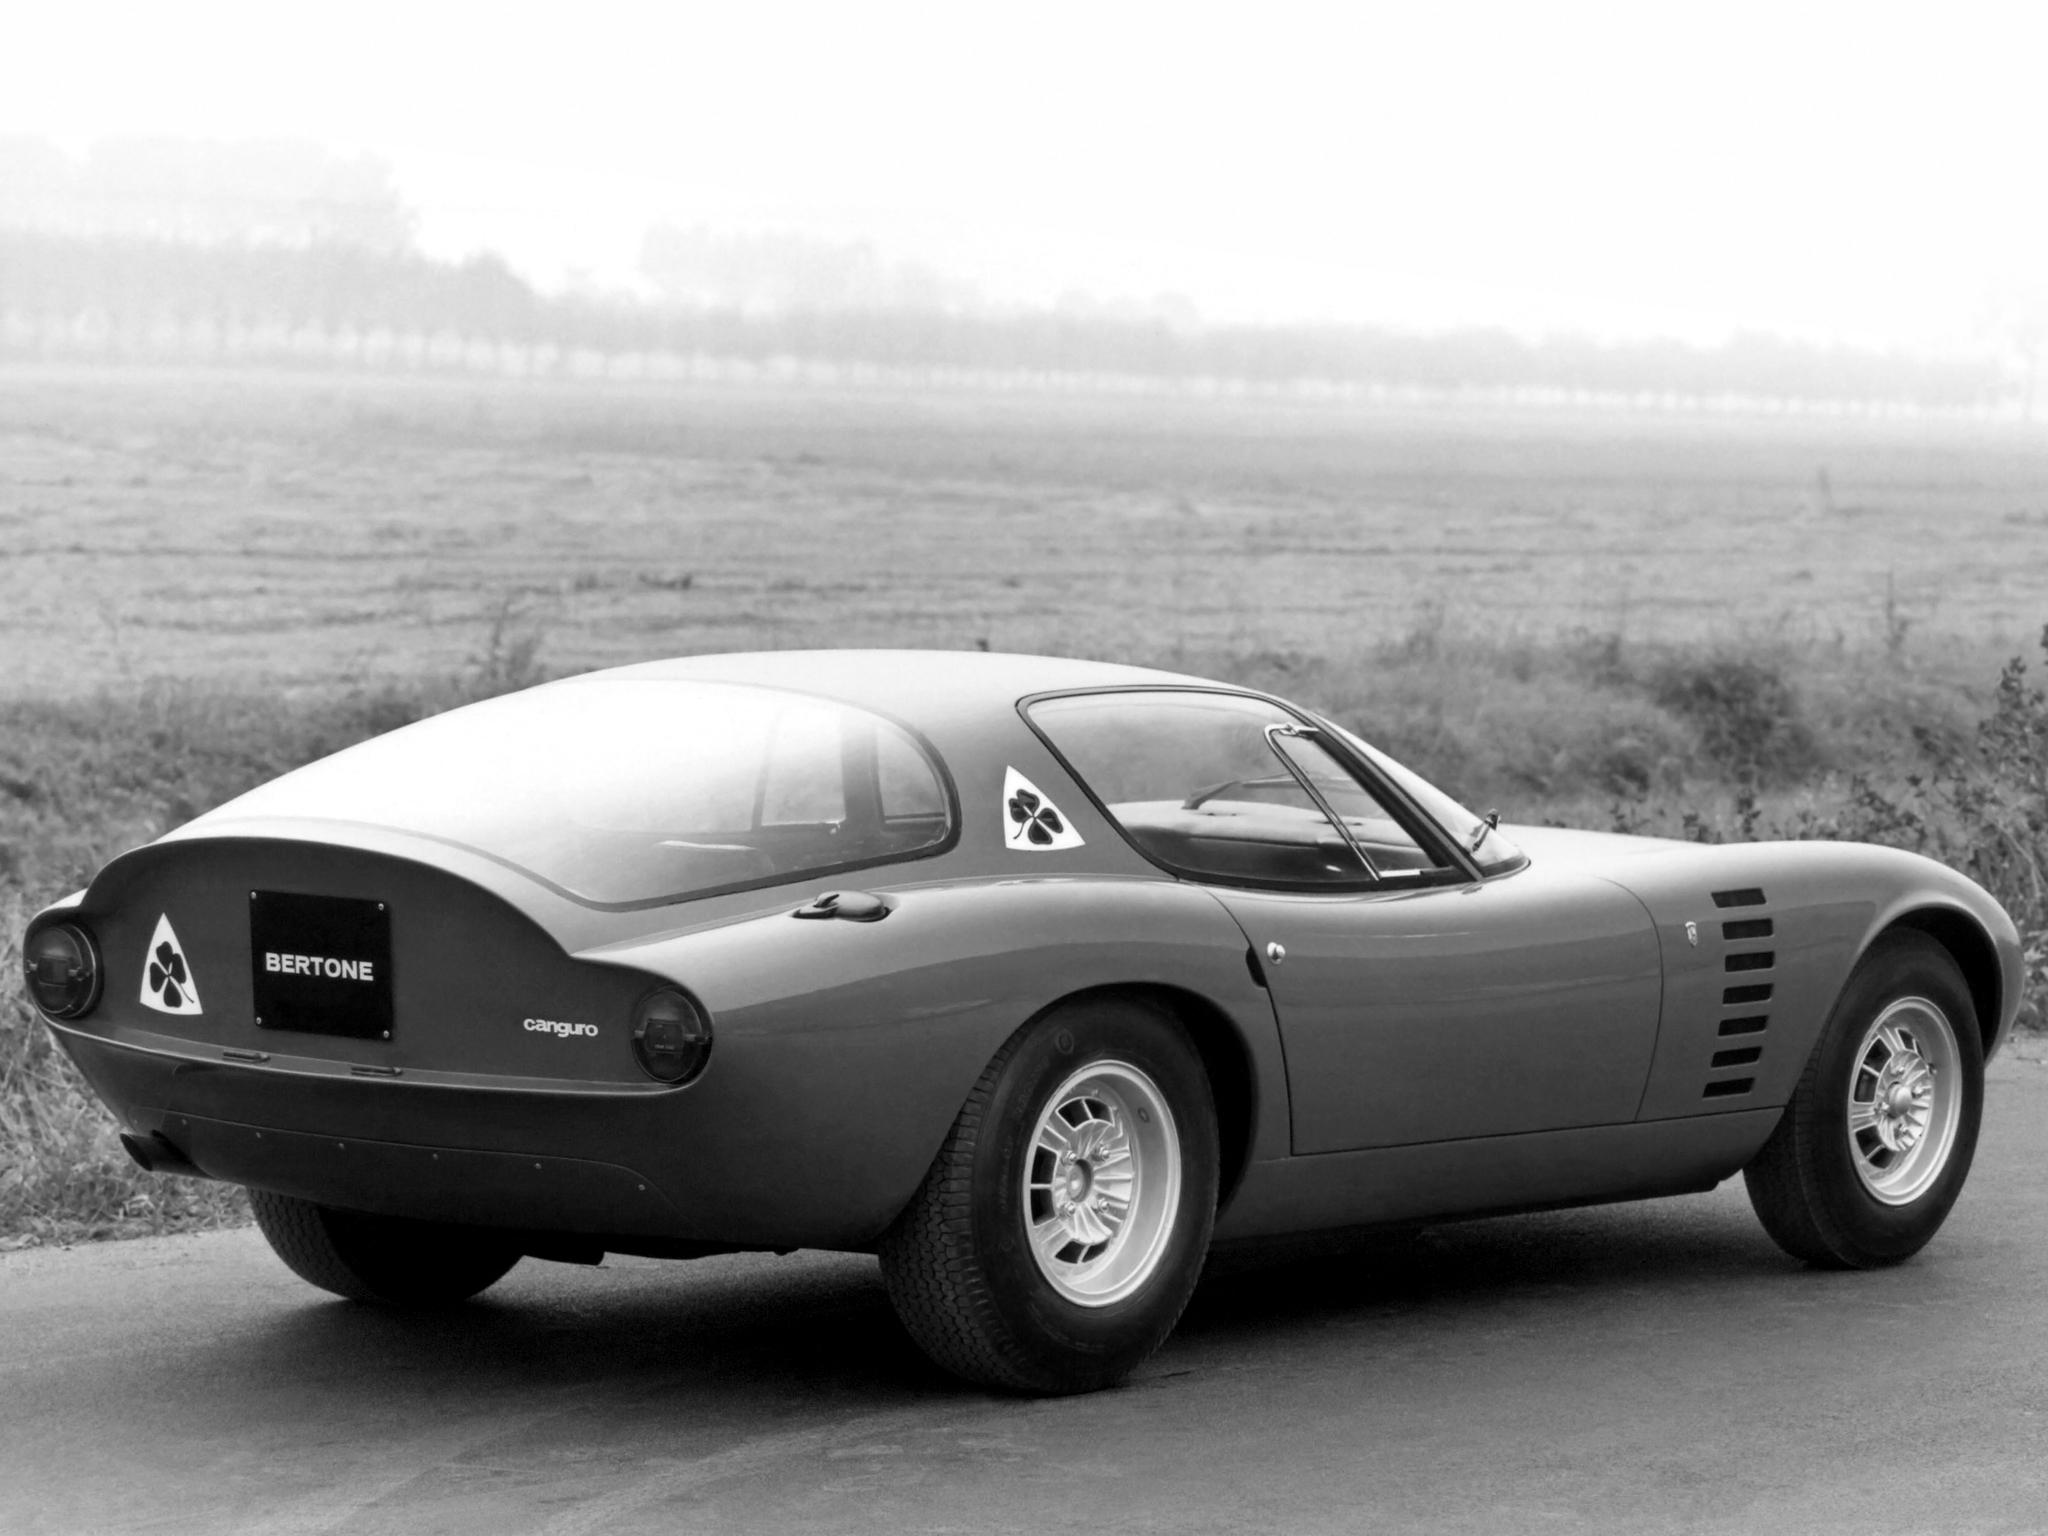 1964 Concept - Bertone Canguro